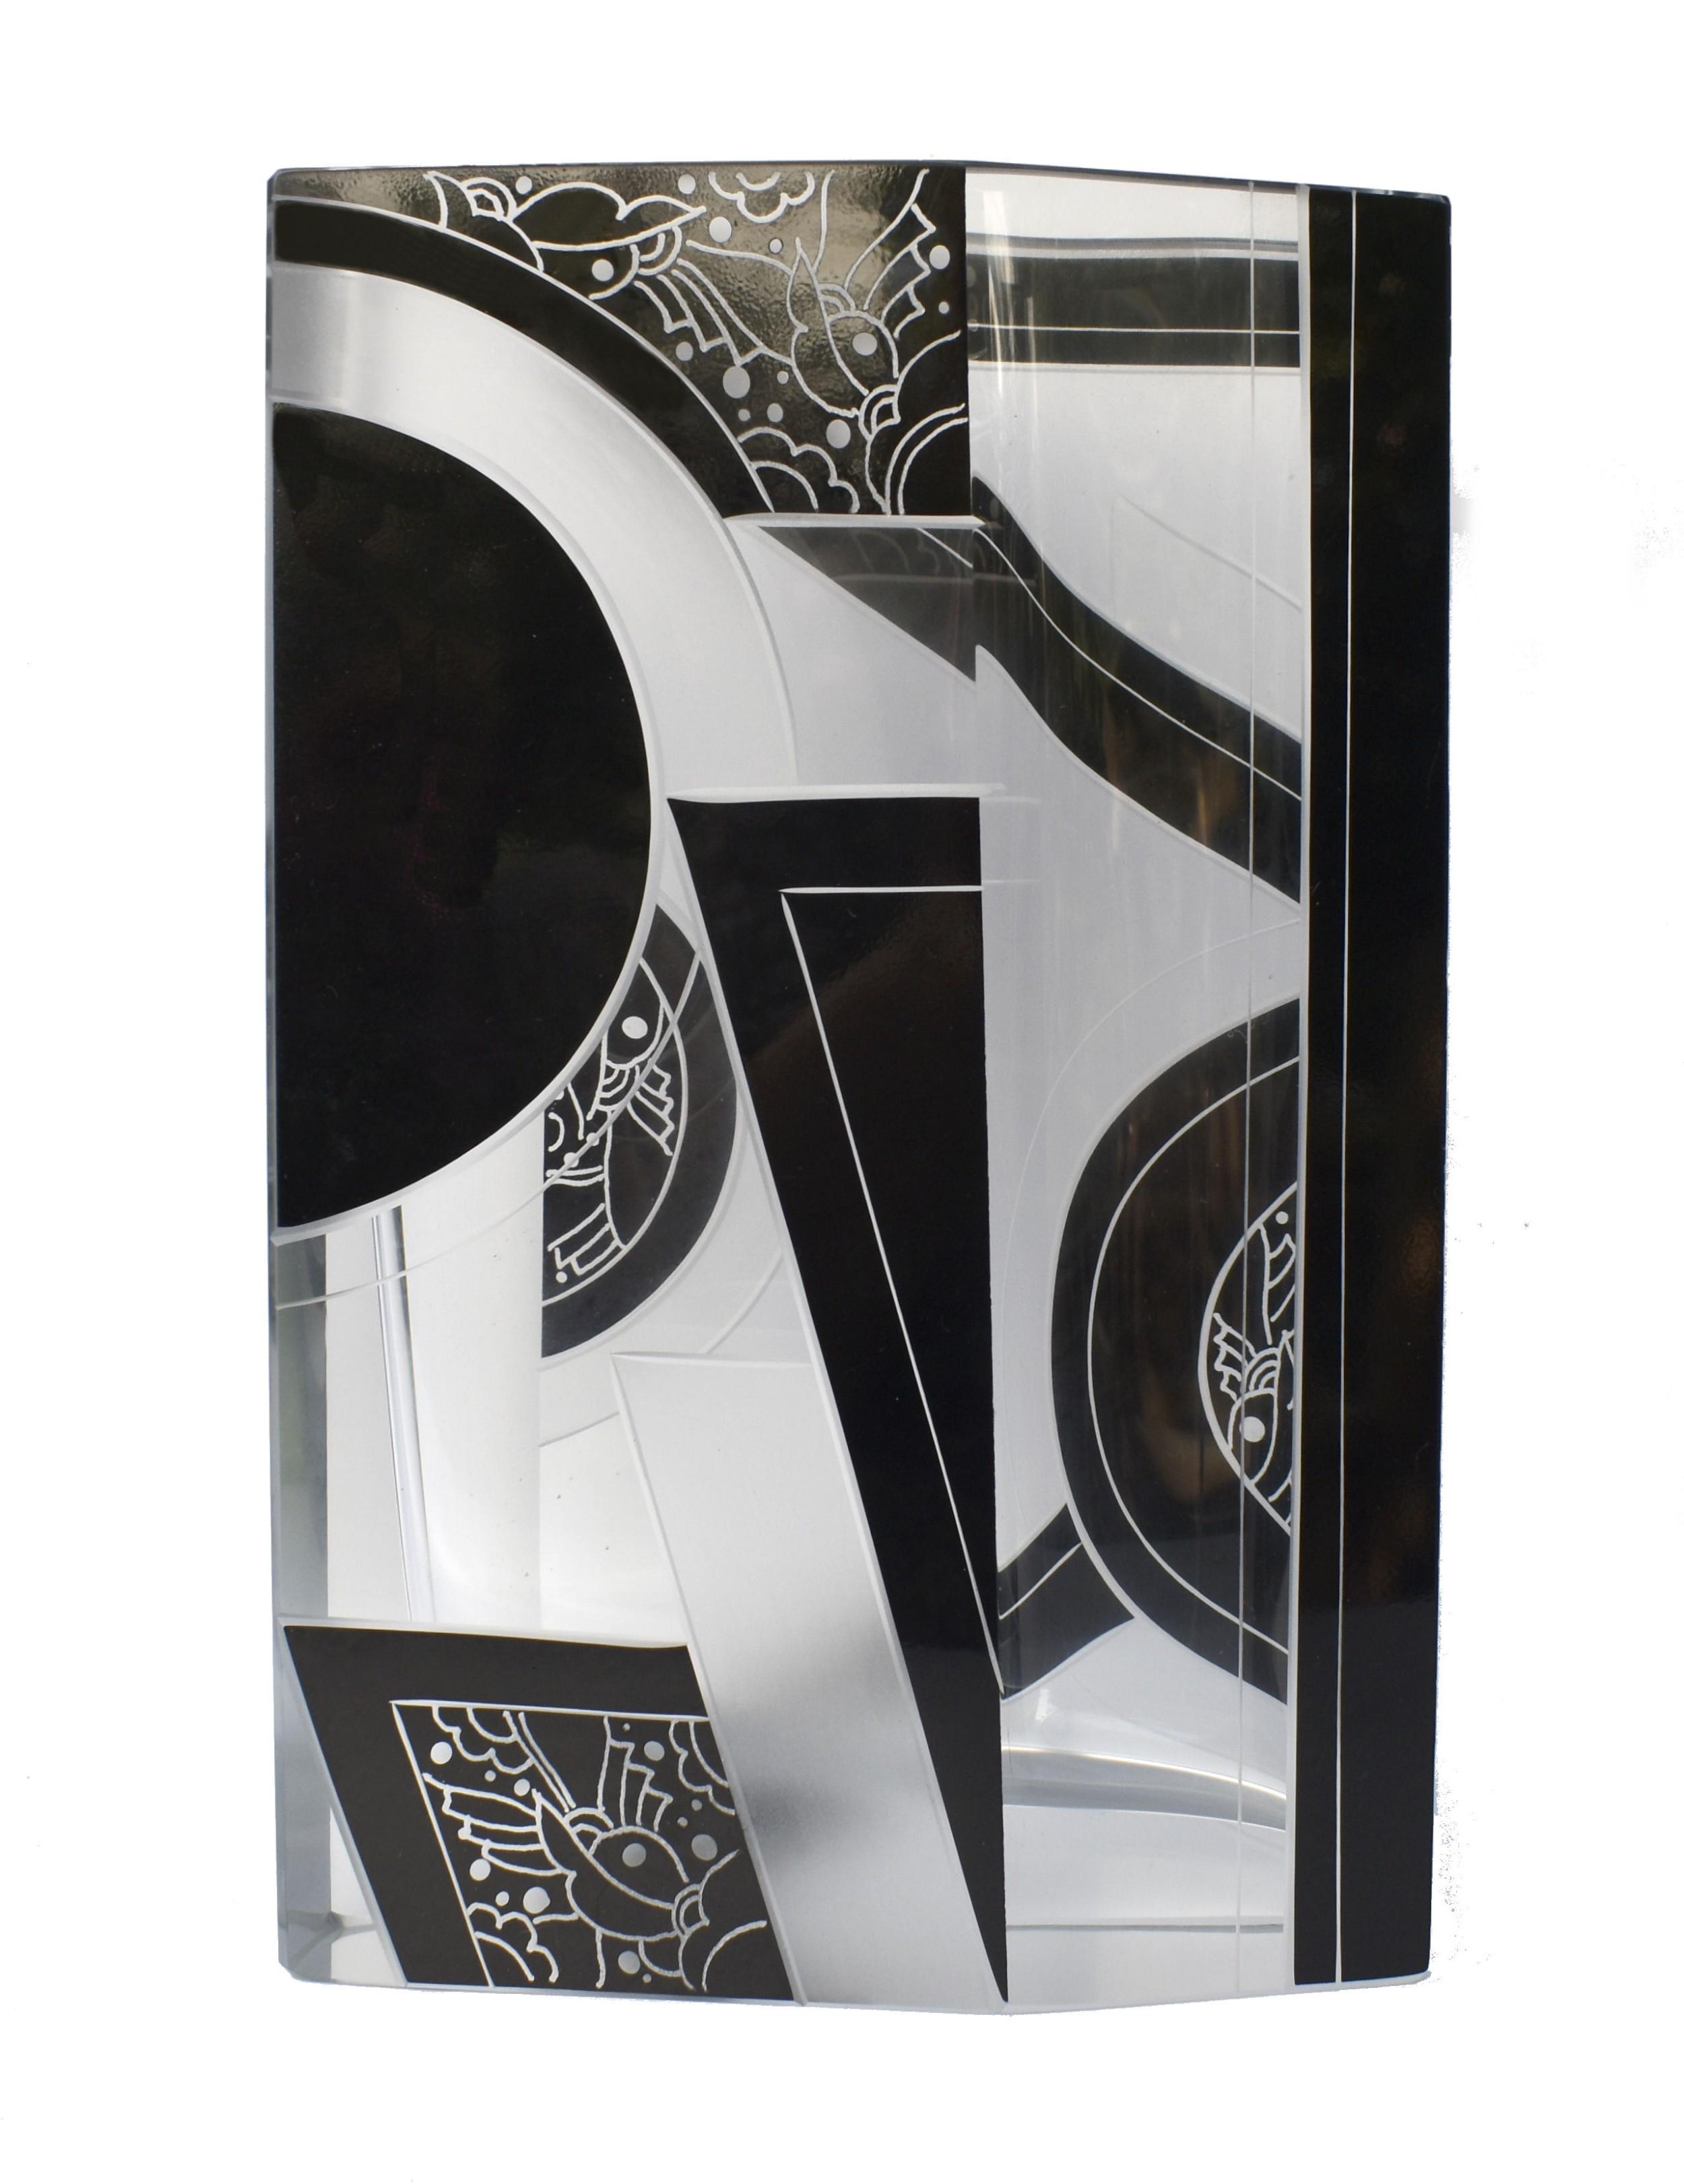 art deco glass vase by karl palda c1930